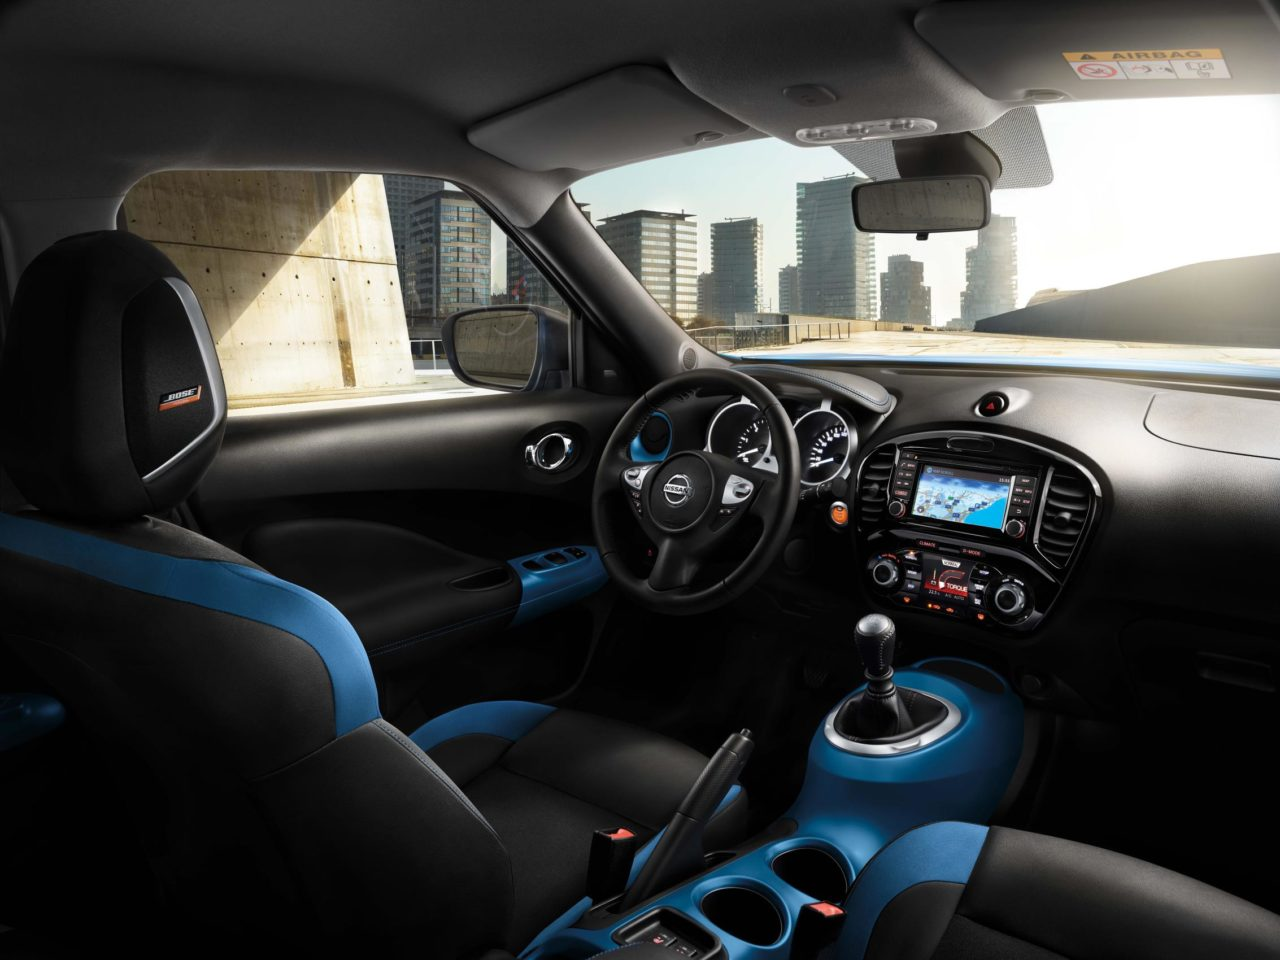 2019 Nissan Juke Hits UK Market with Slight Enhancements